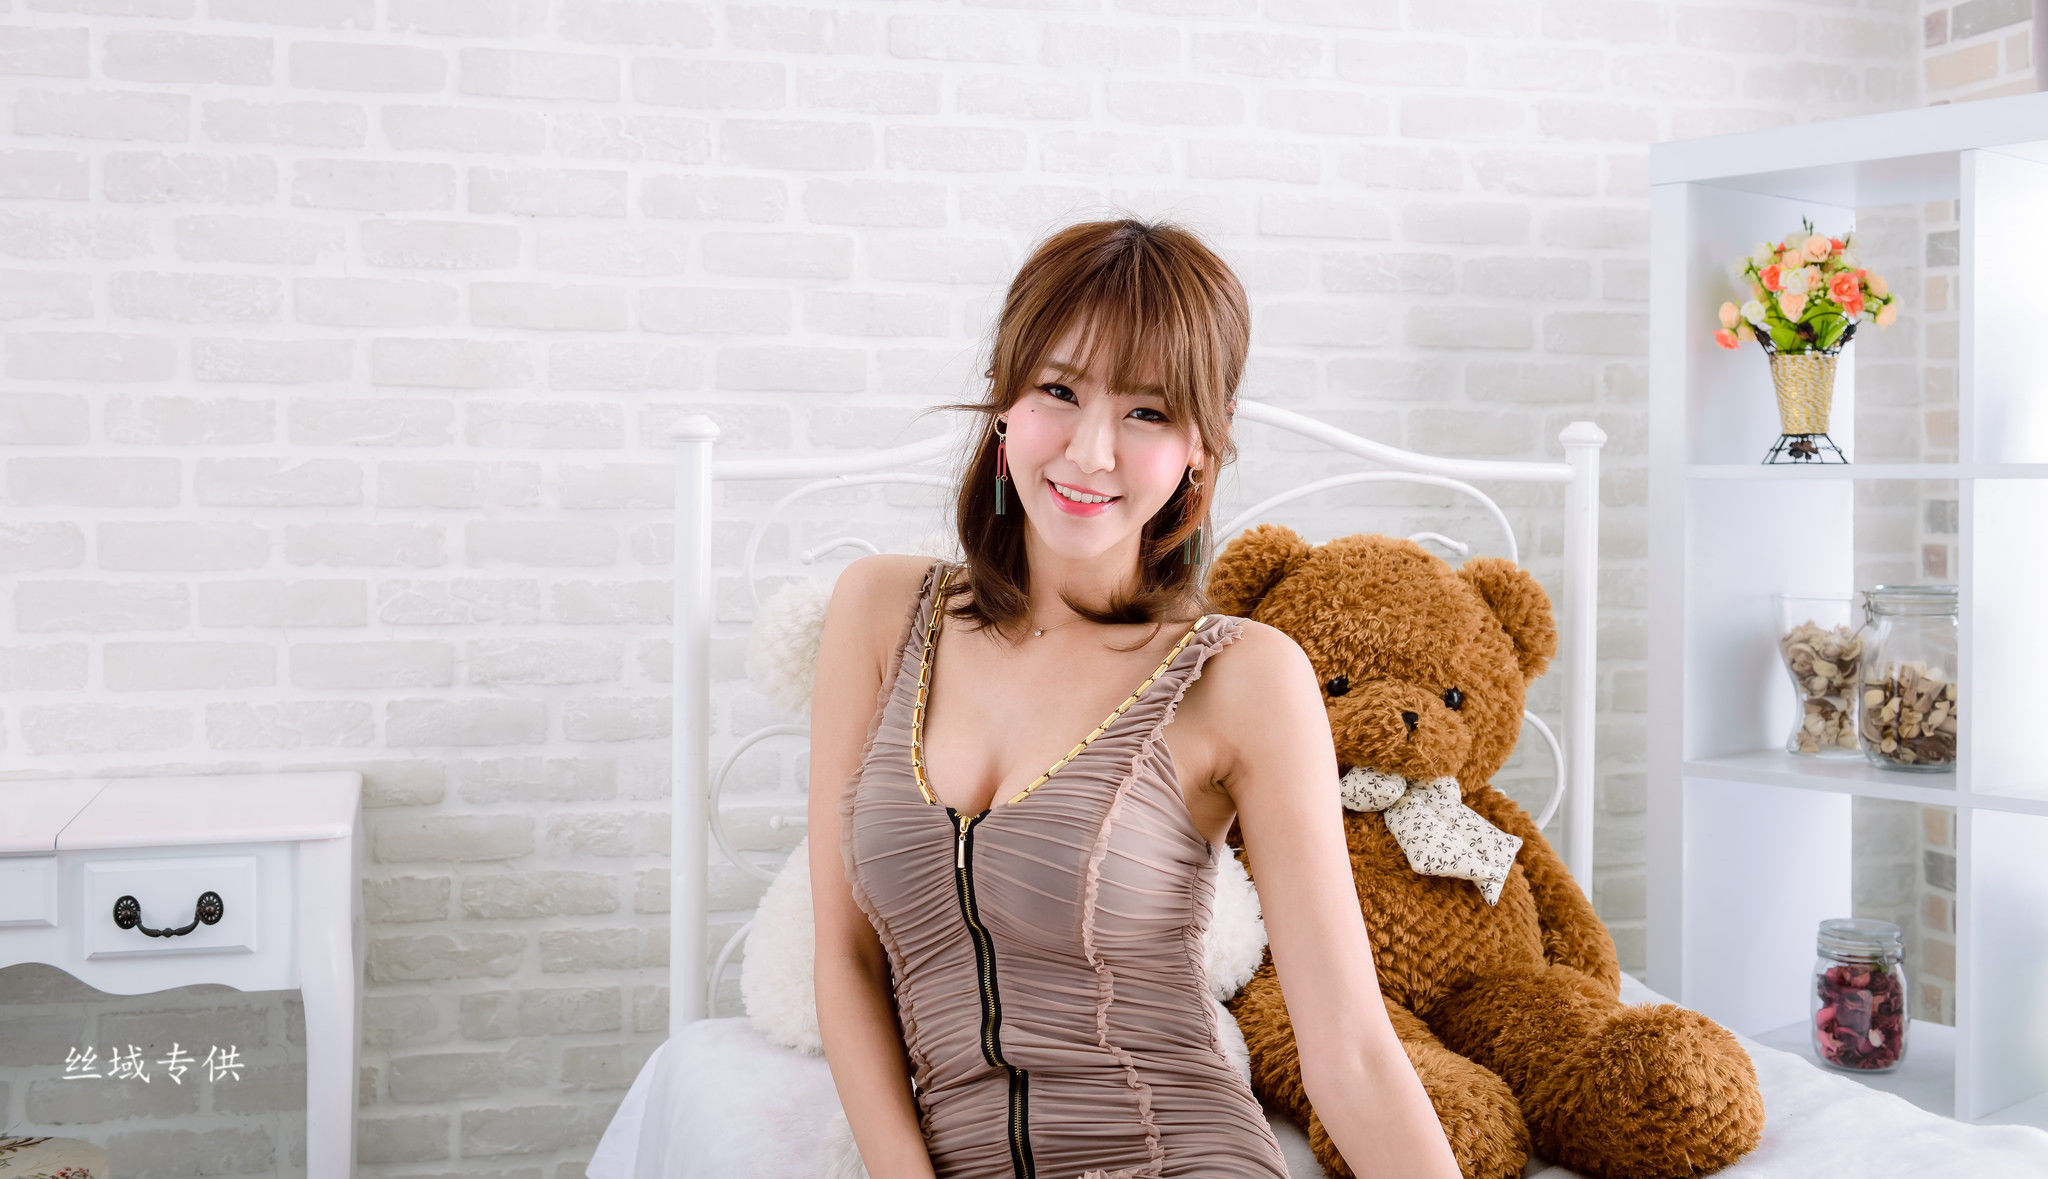 Winnie小雪 - 3套美腿优雅服装写真图片合集